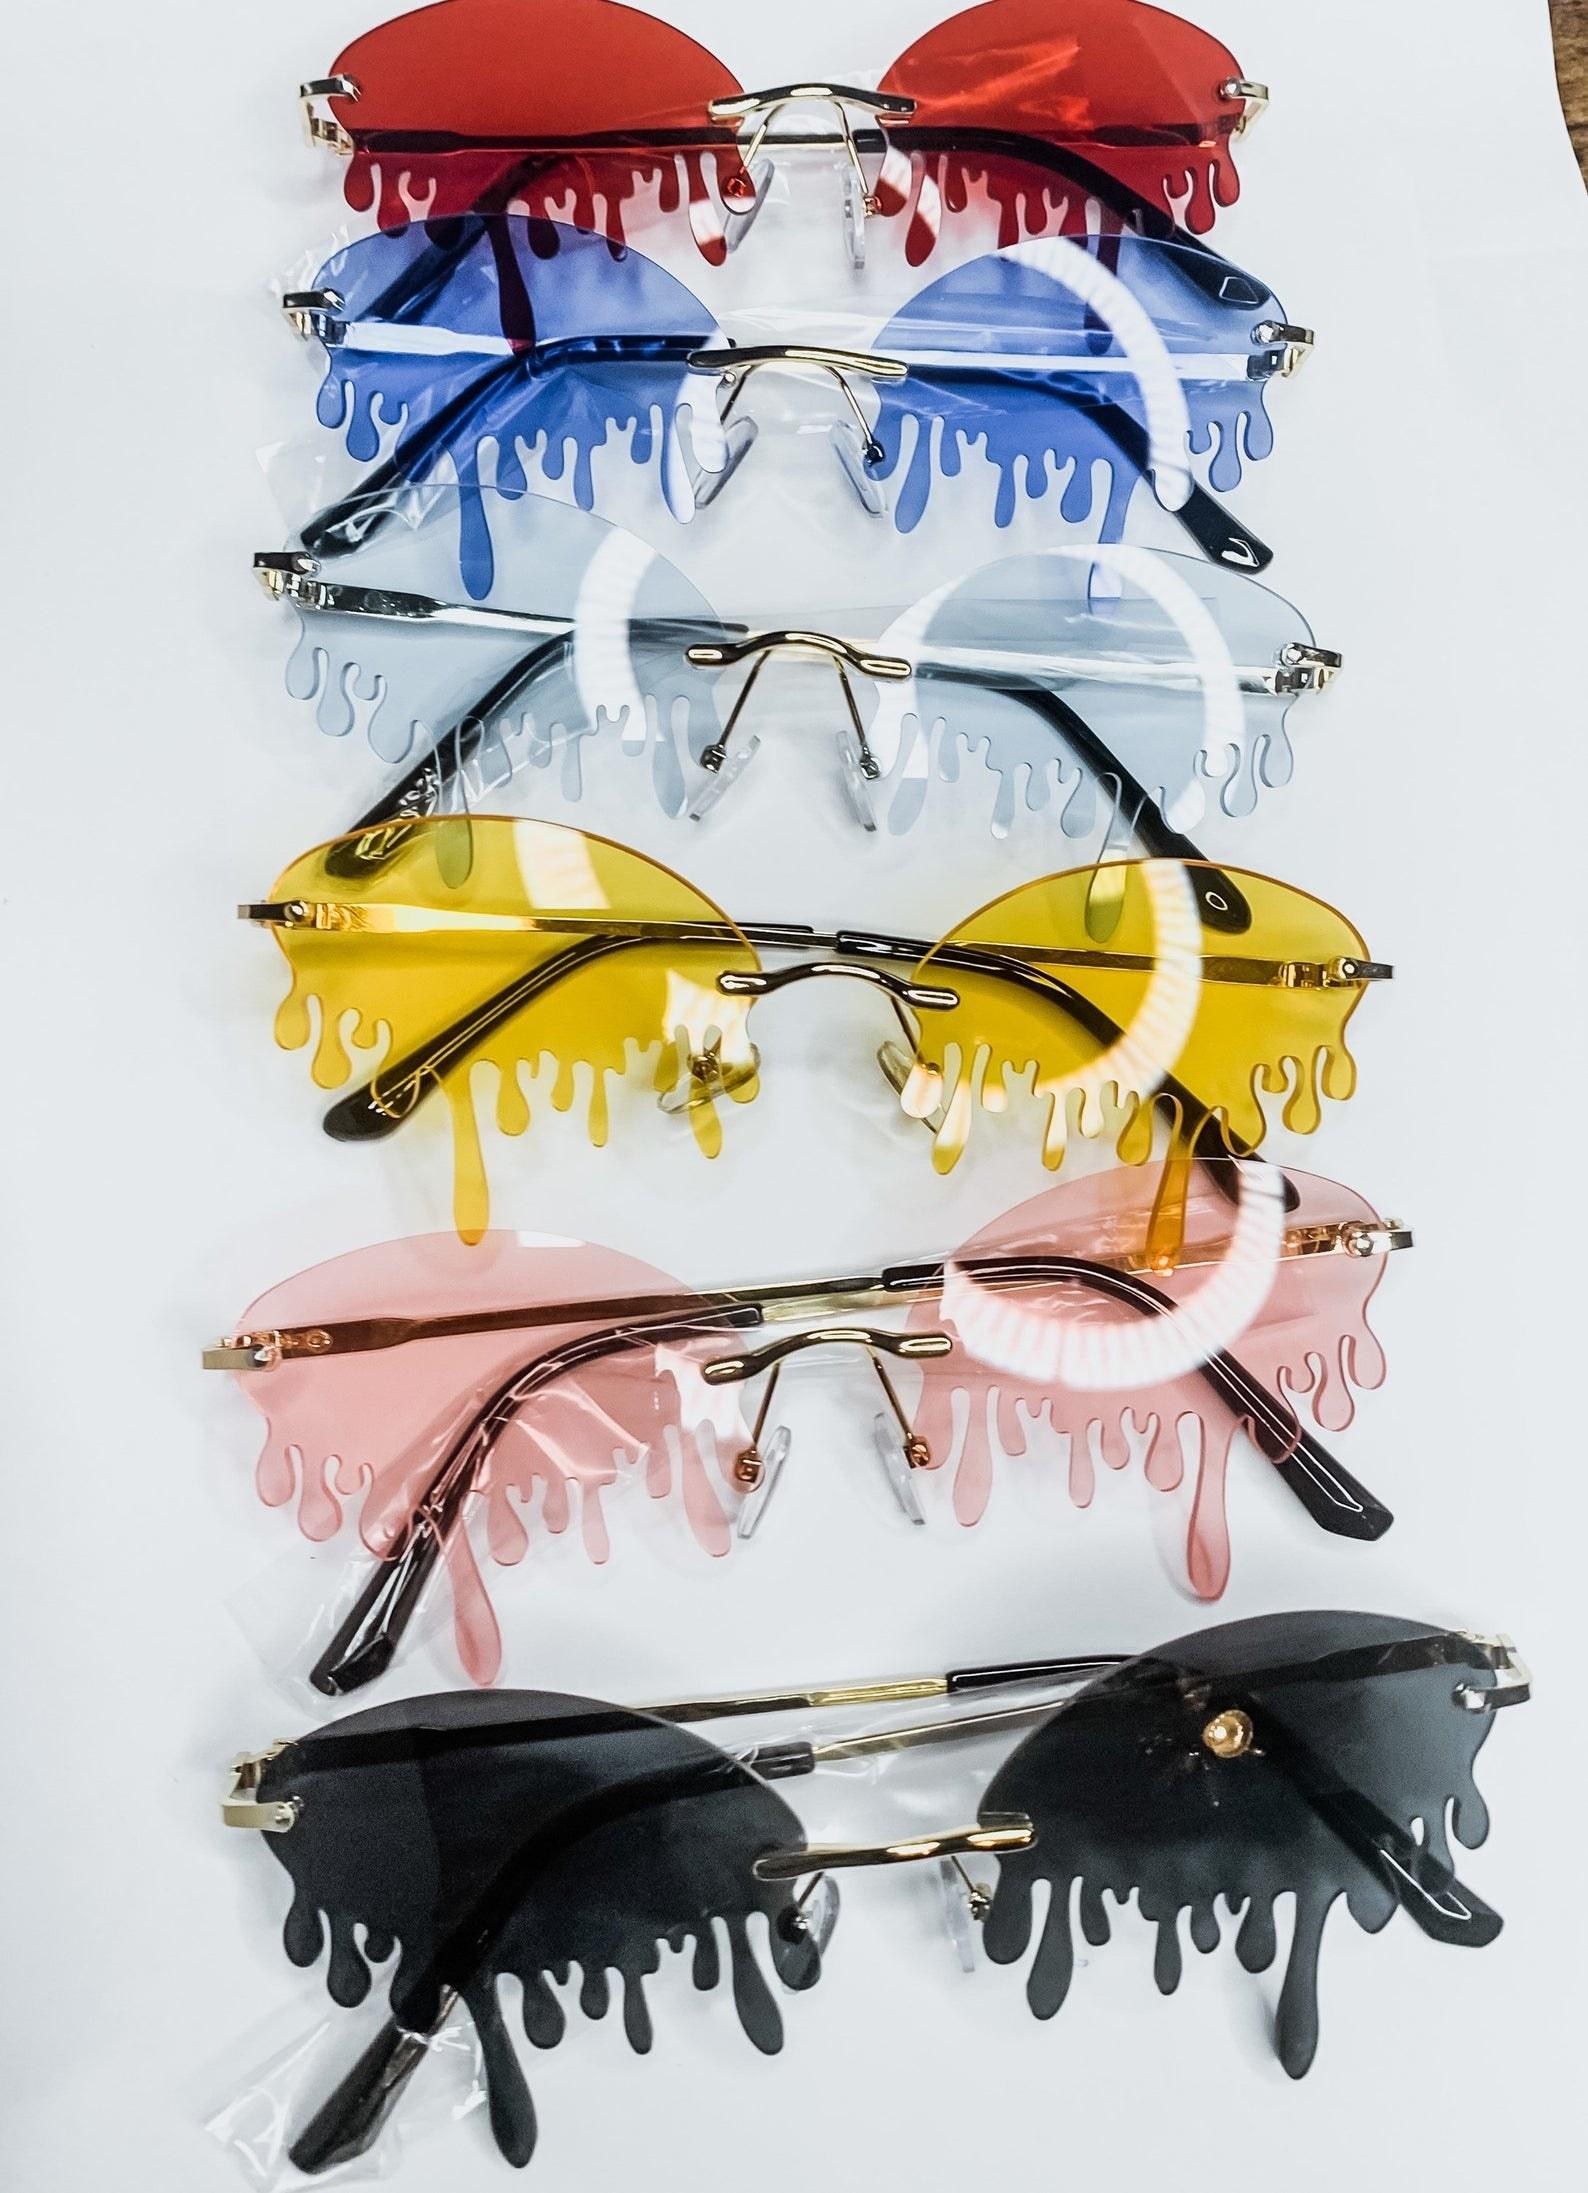 drip sunglasses in various colors